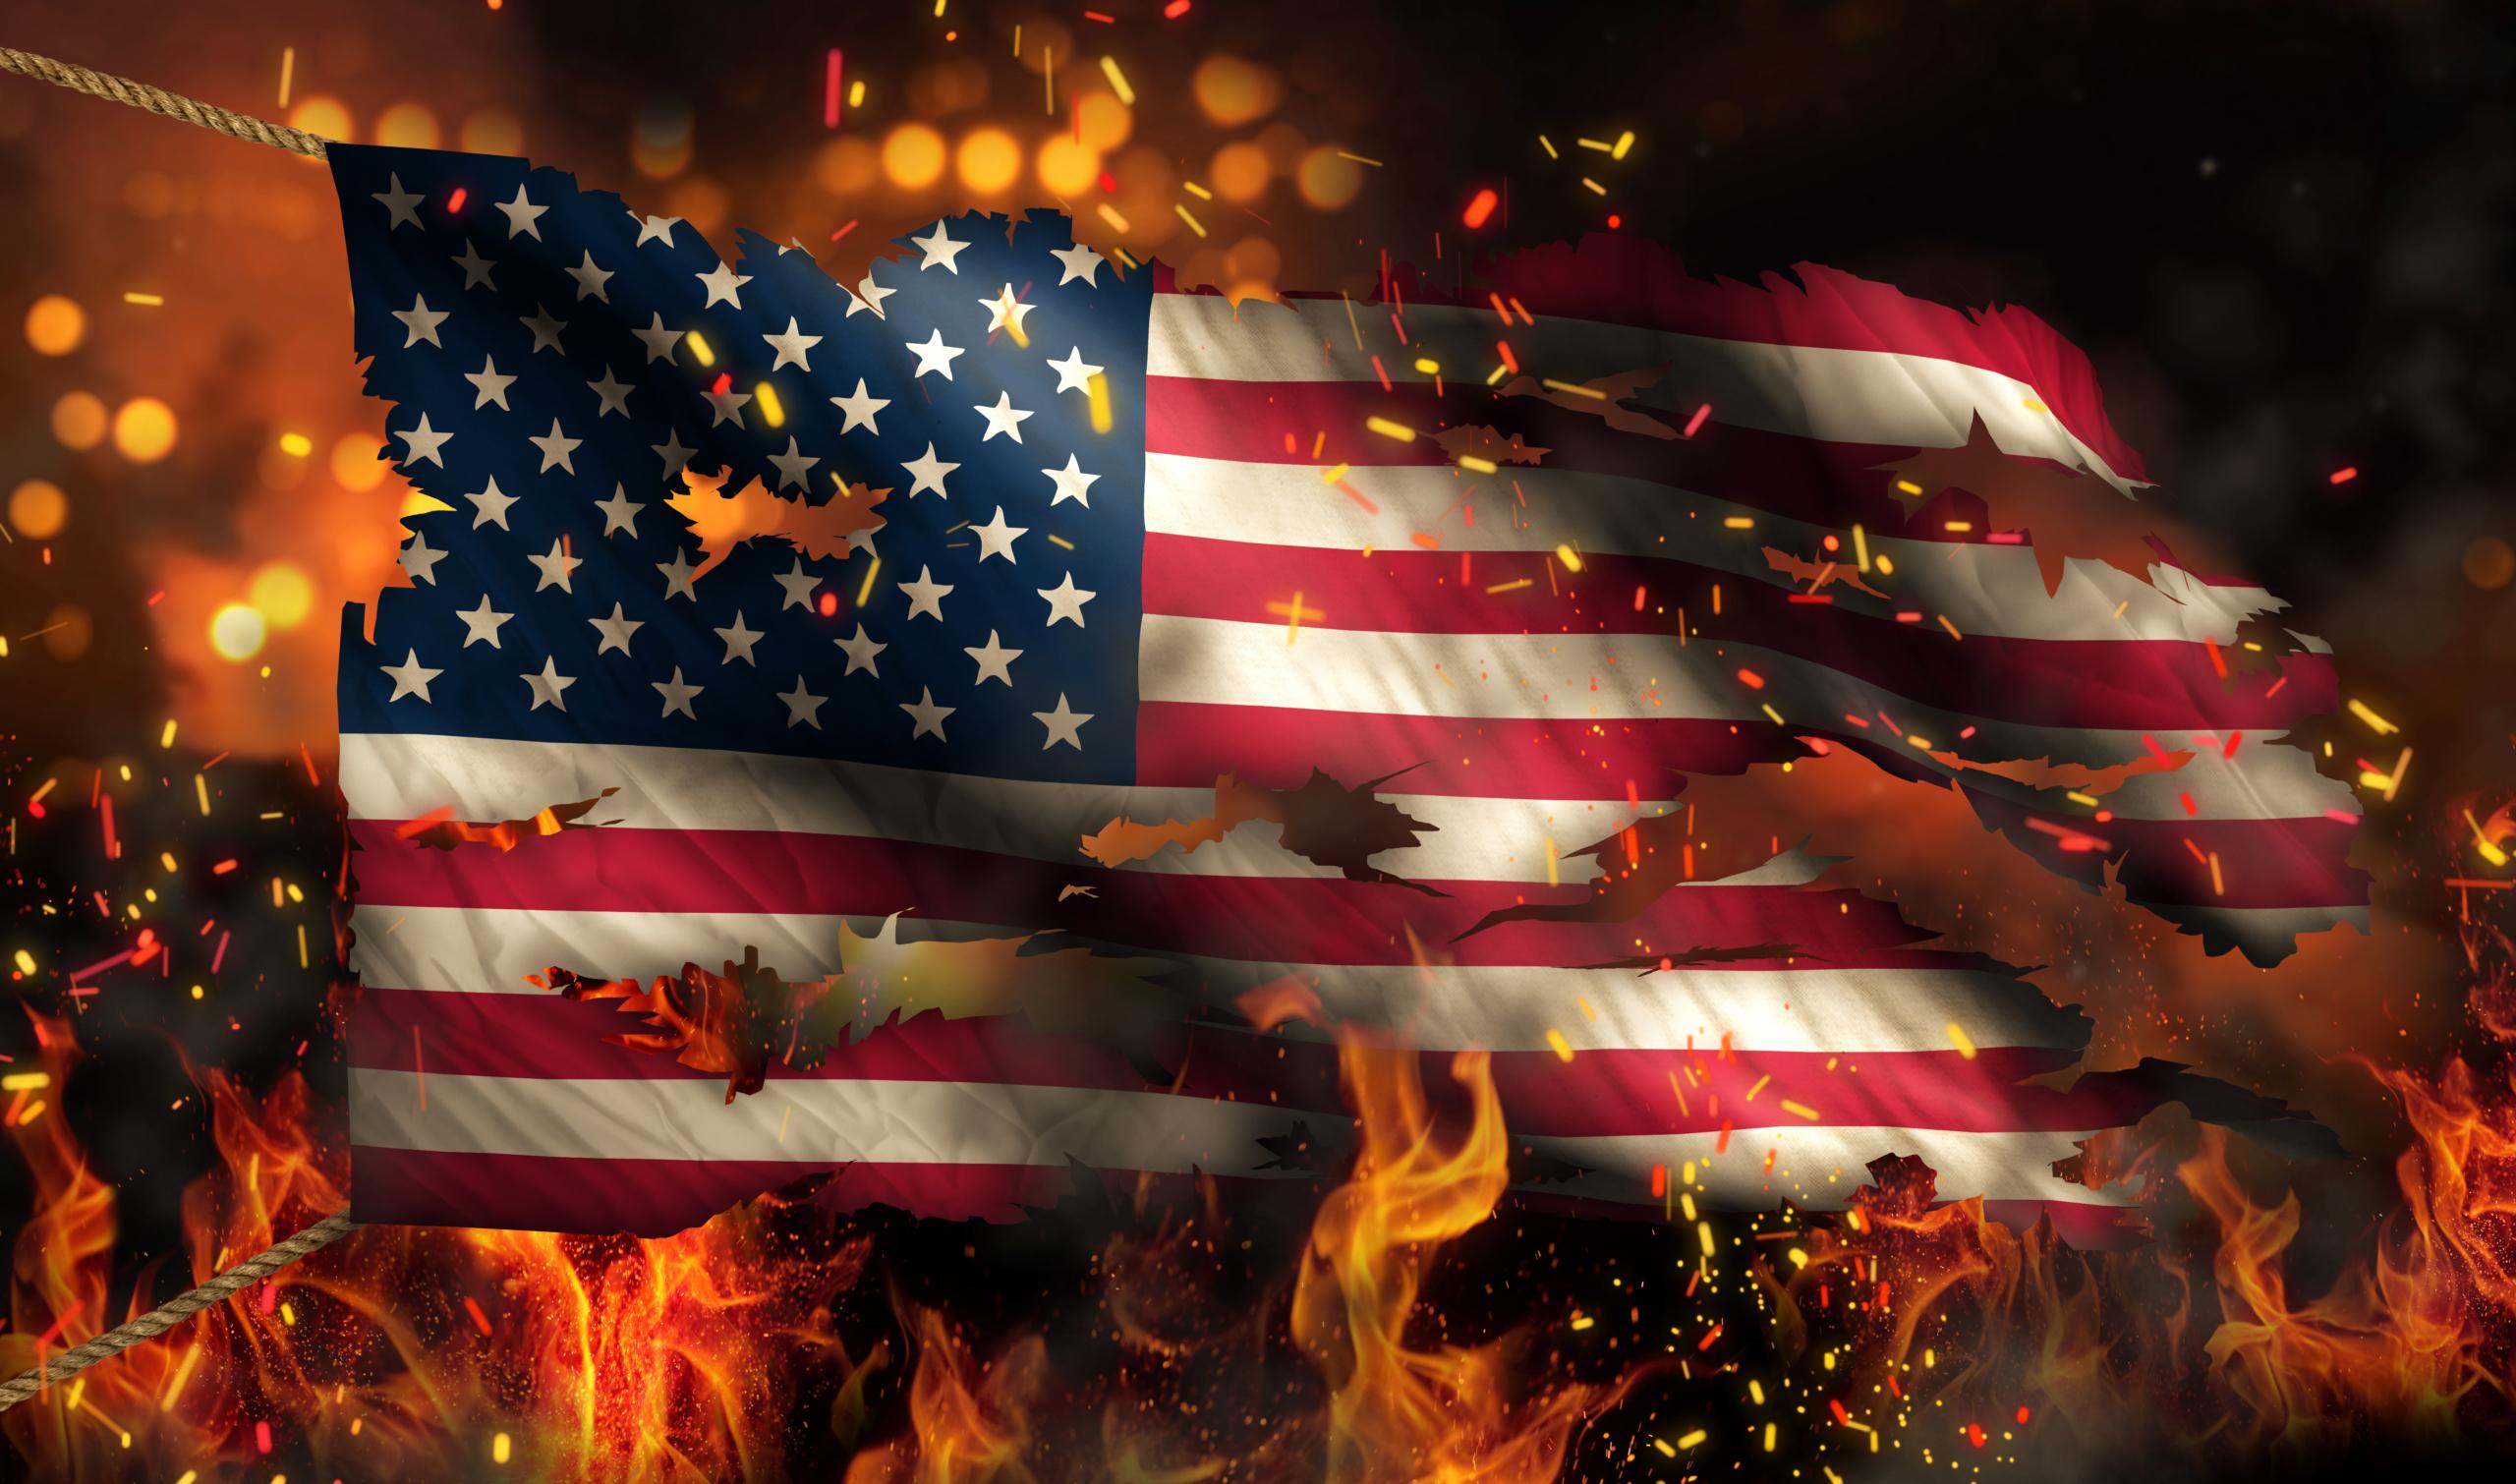 America is on fire